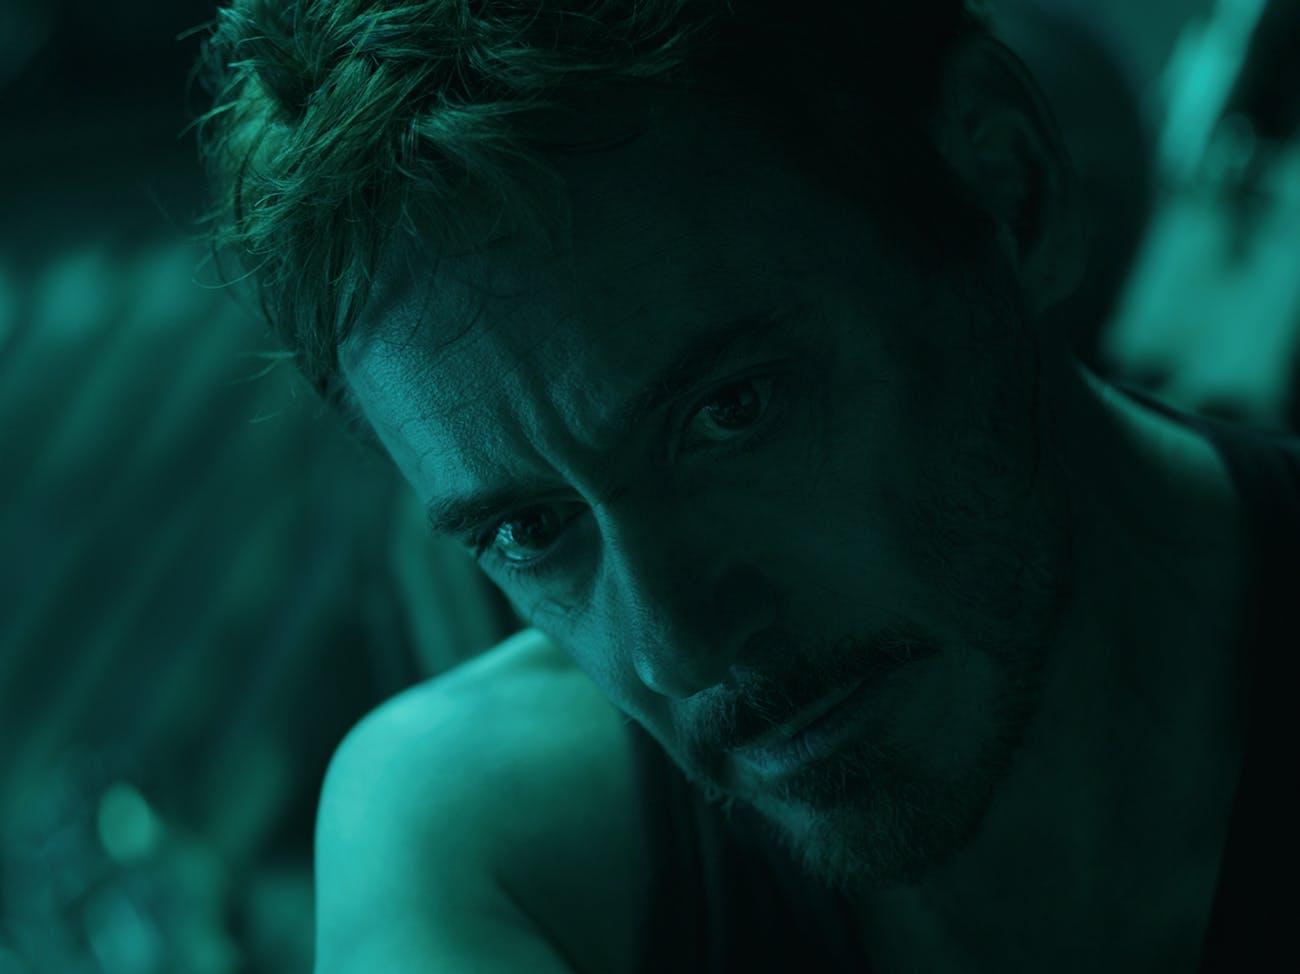 Avengers Endgame Spoilers Ending Explained Who Dies And